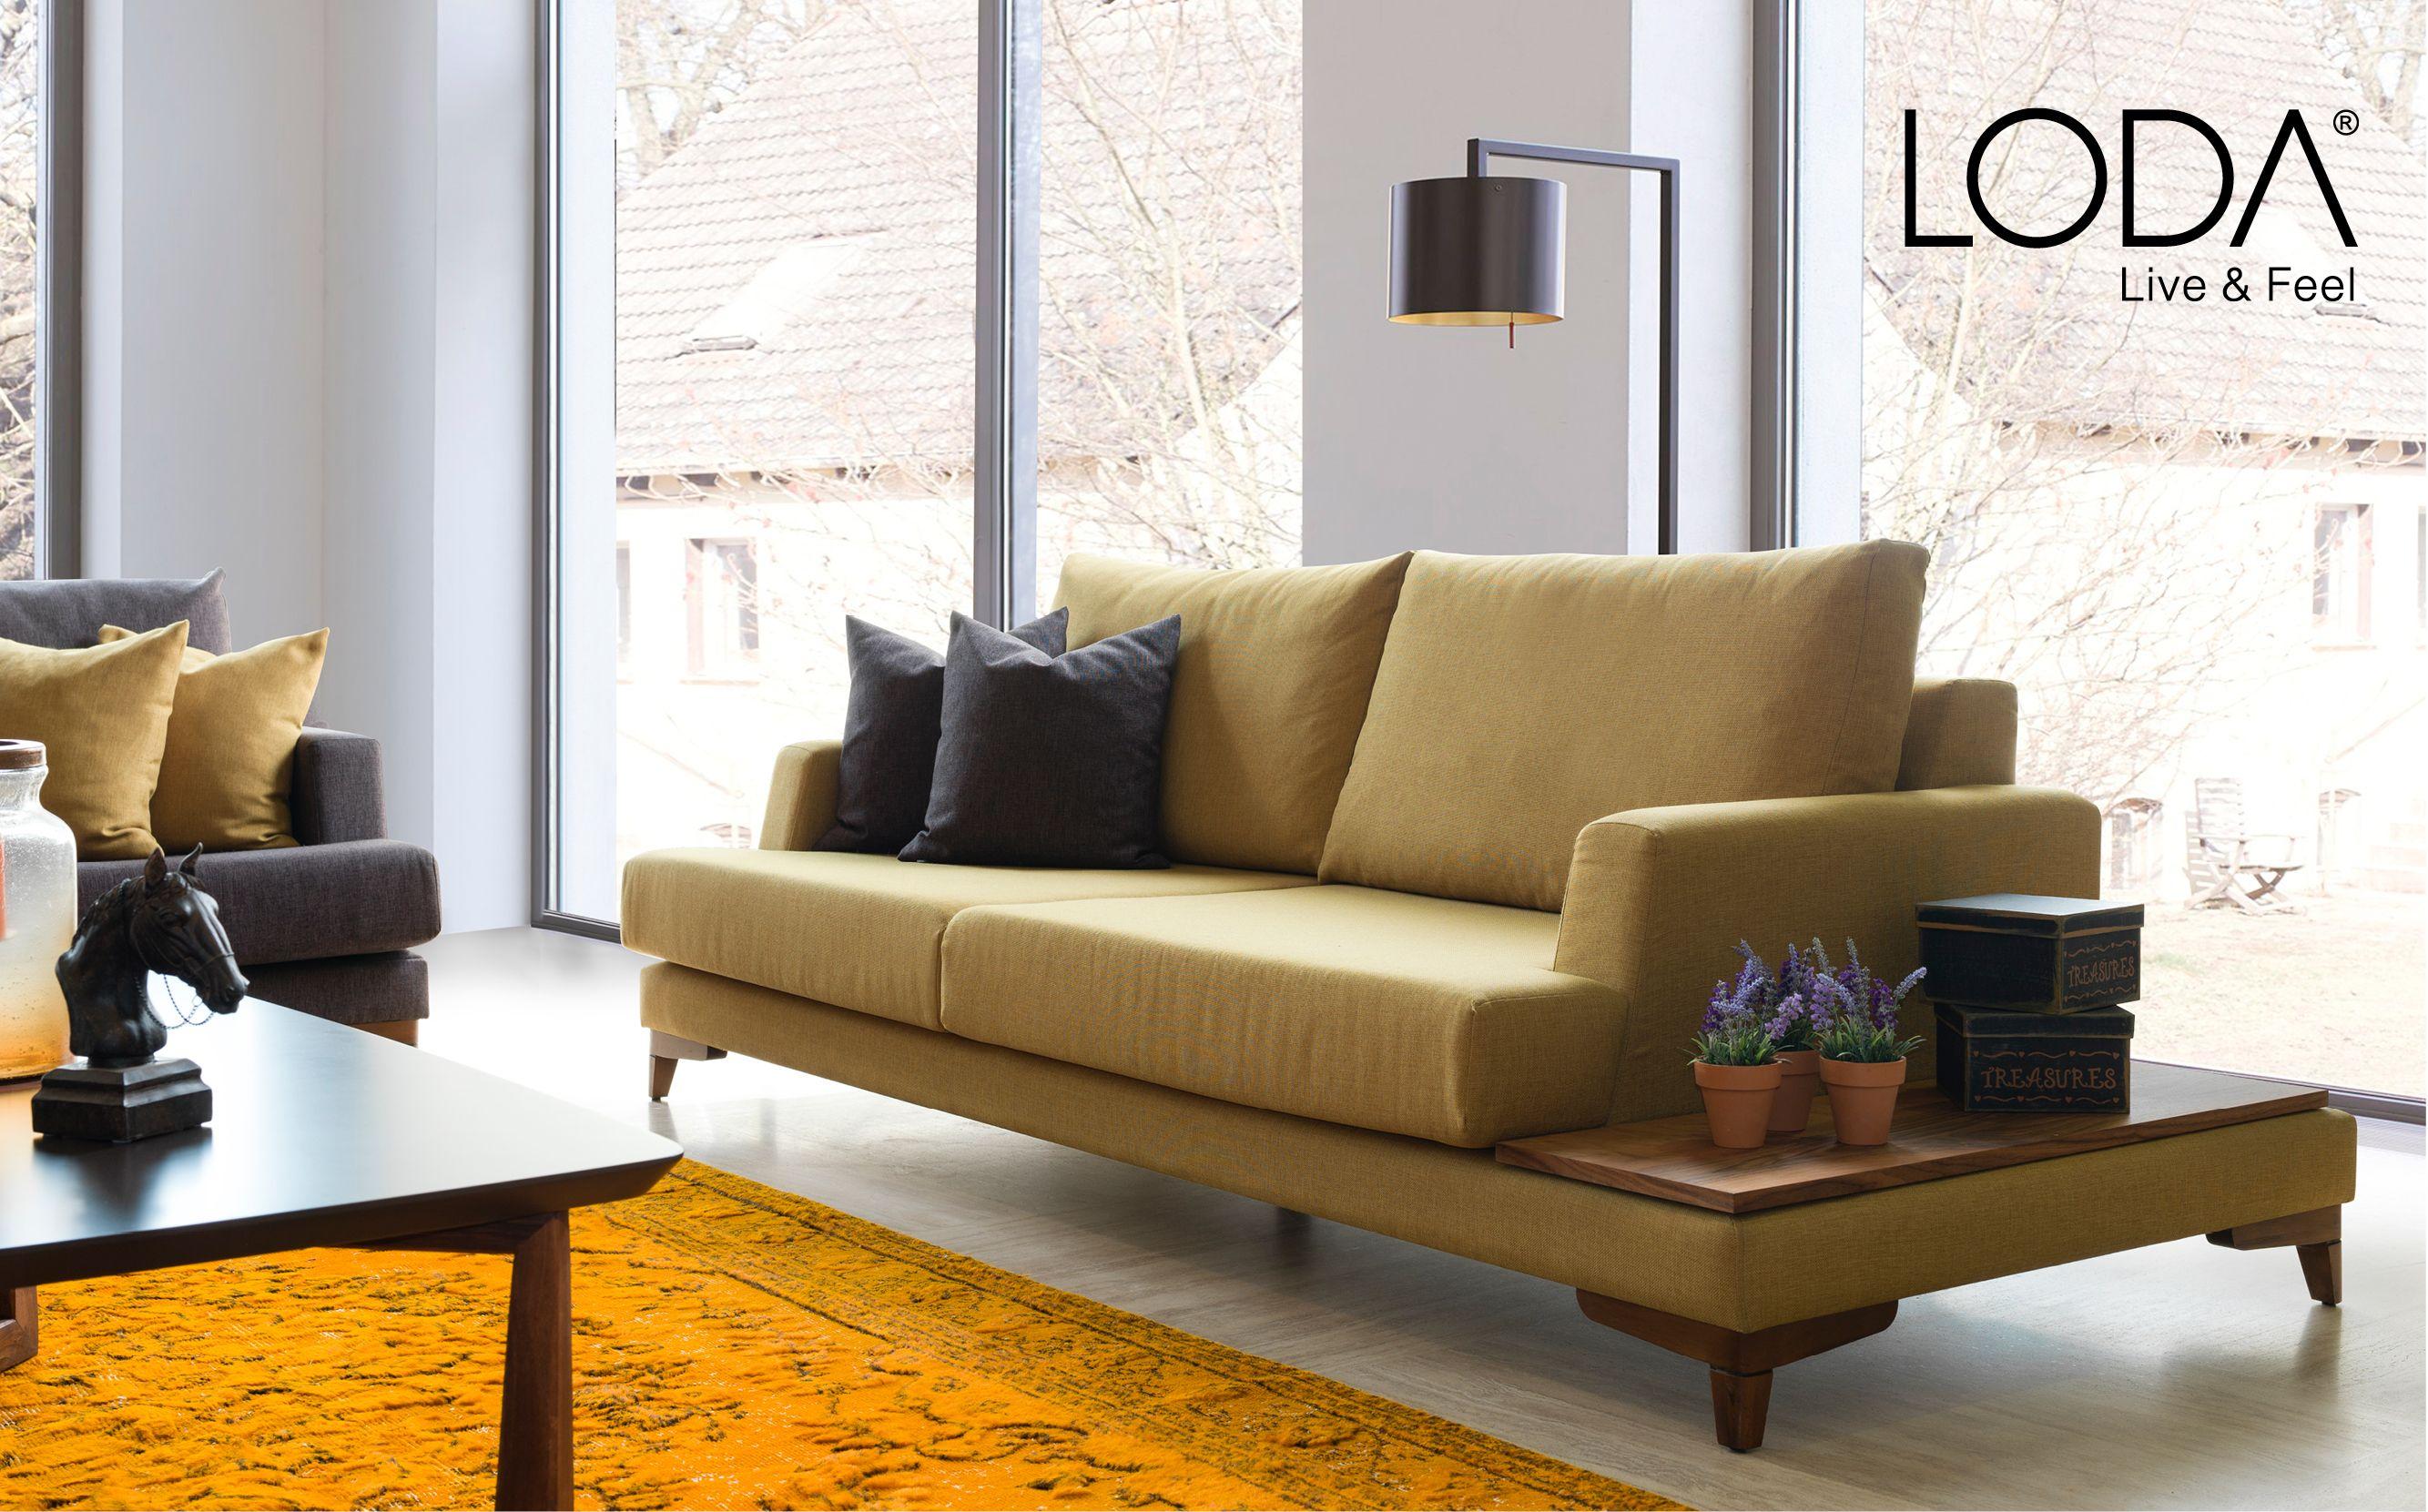 Nova Sehpalı Kanepe Nova Sofa mobilya furniture tasarım